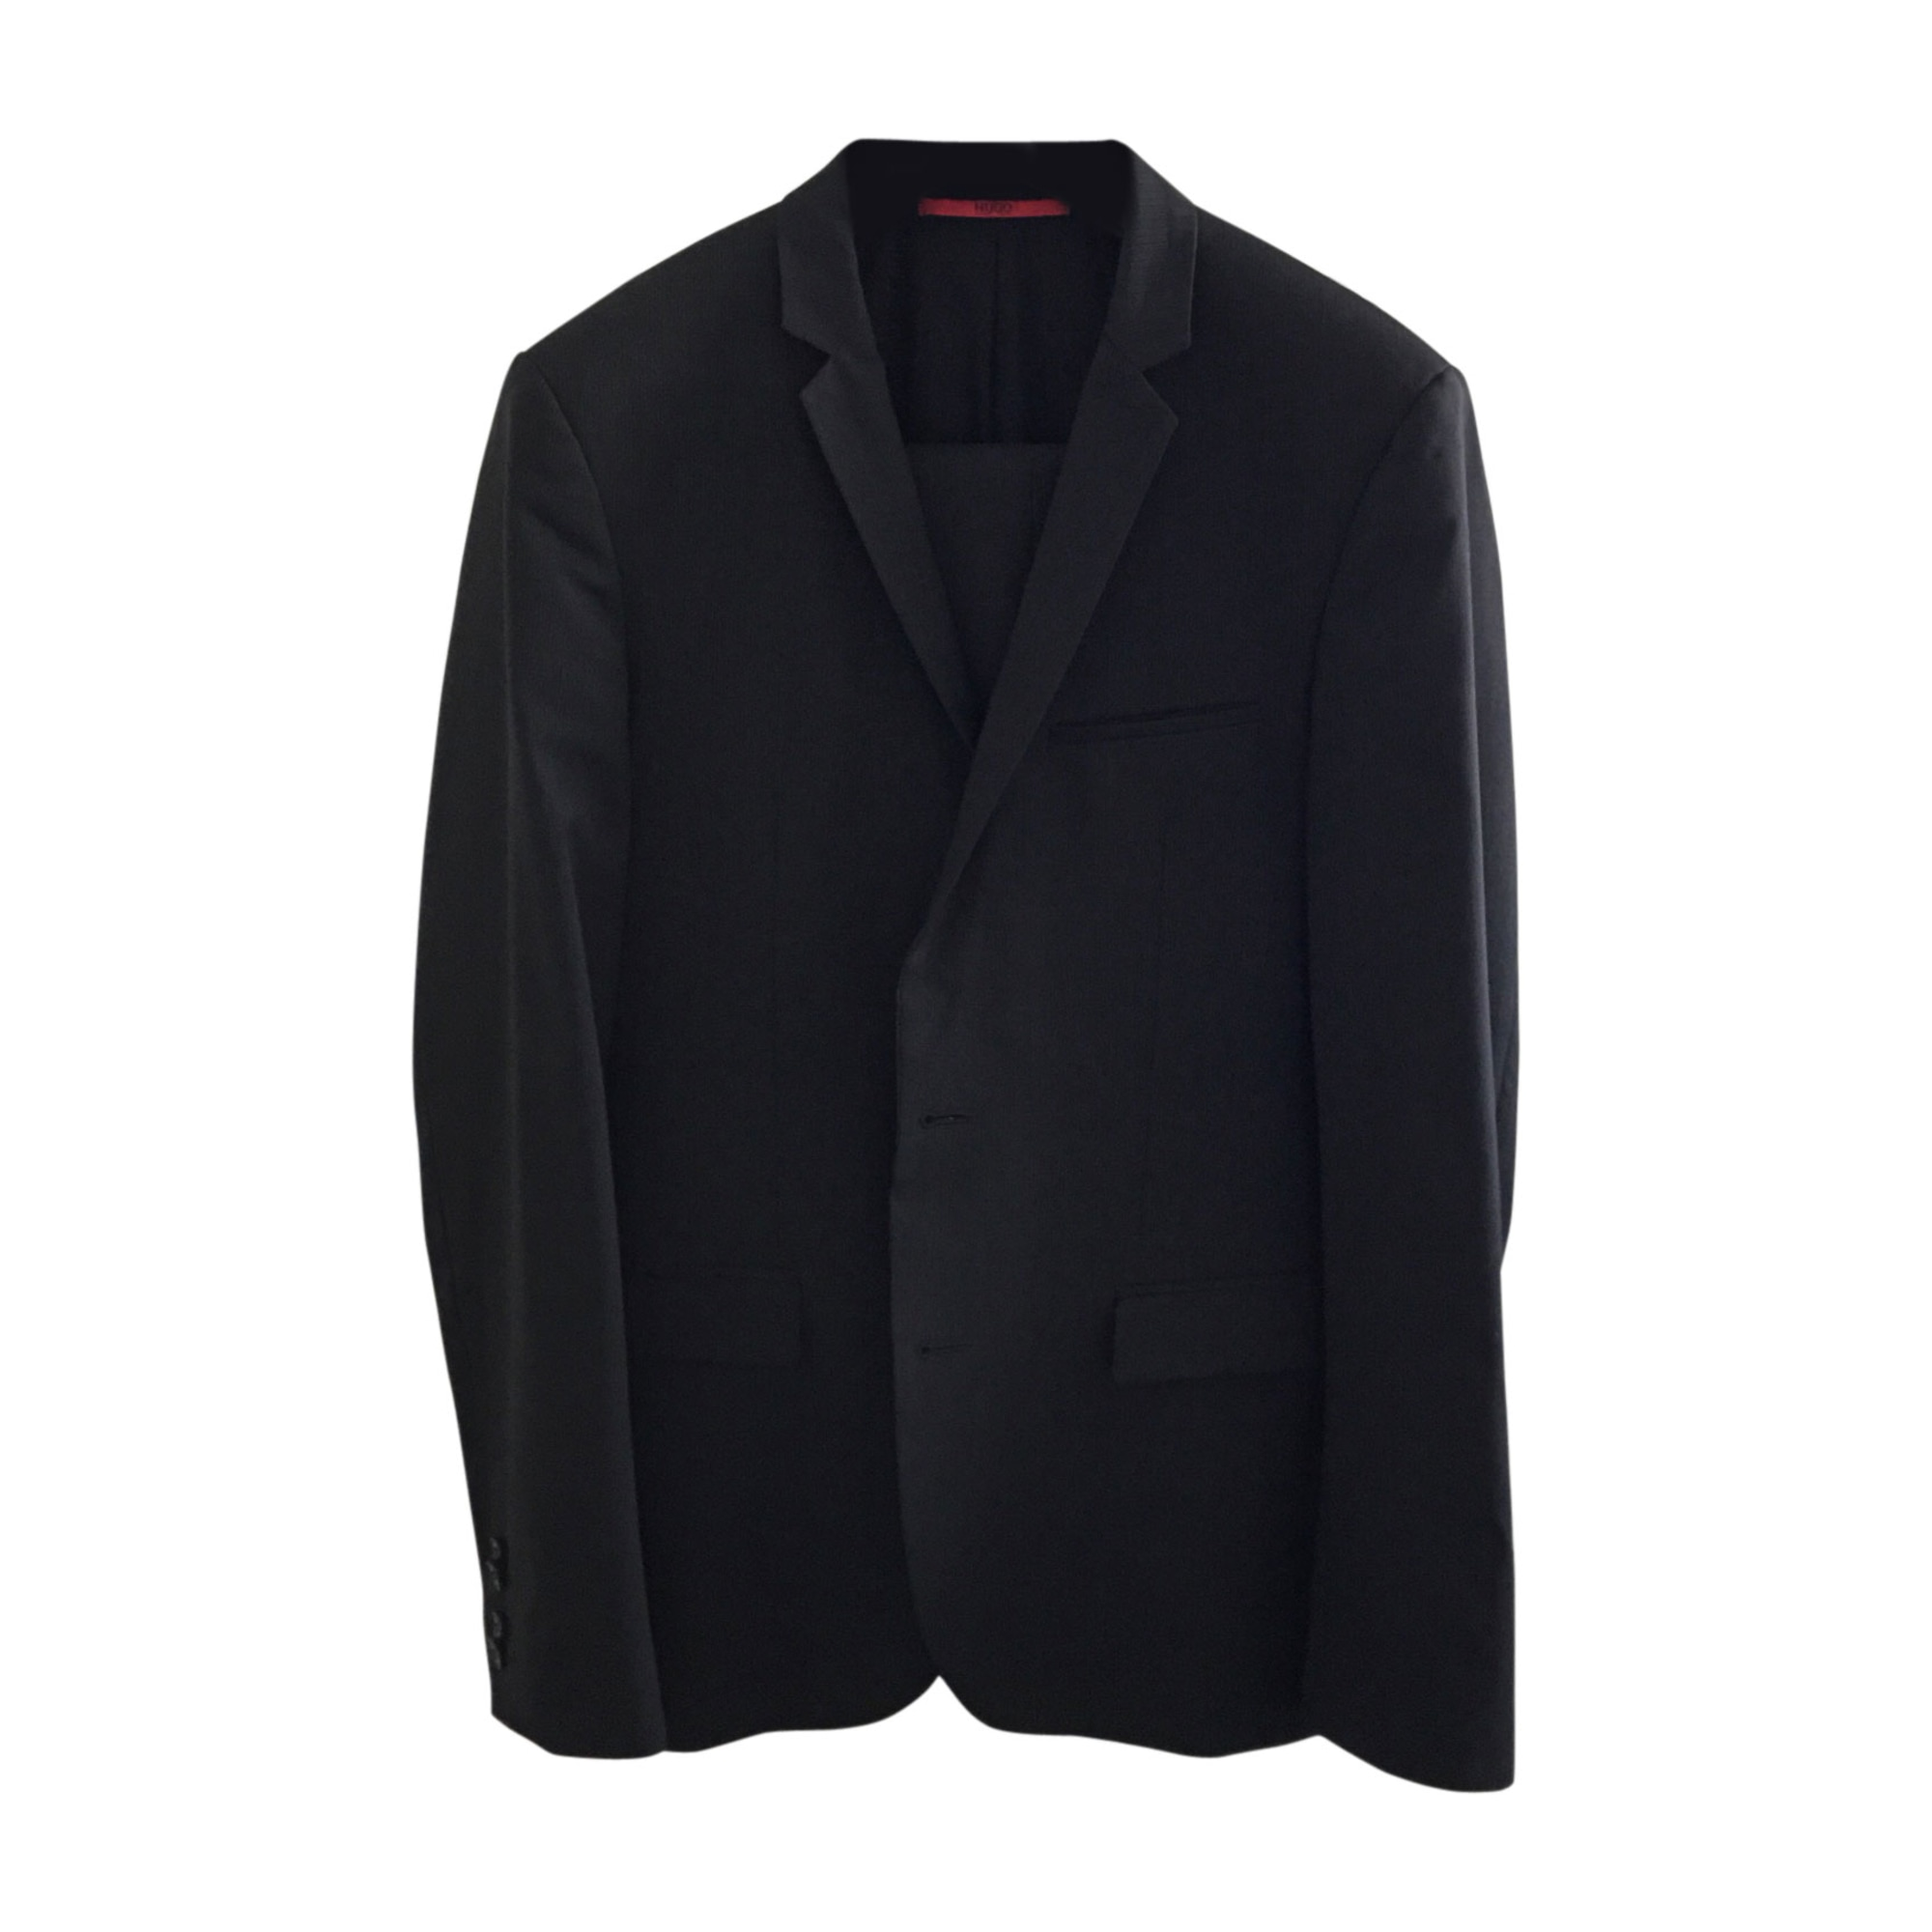 Complete Suit HUGO BOSS Black